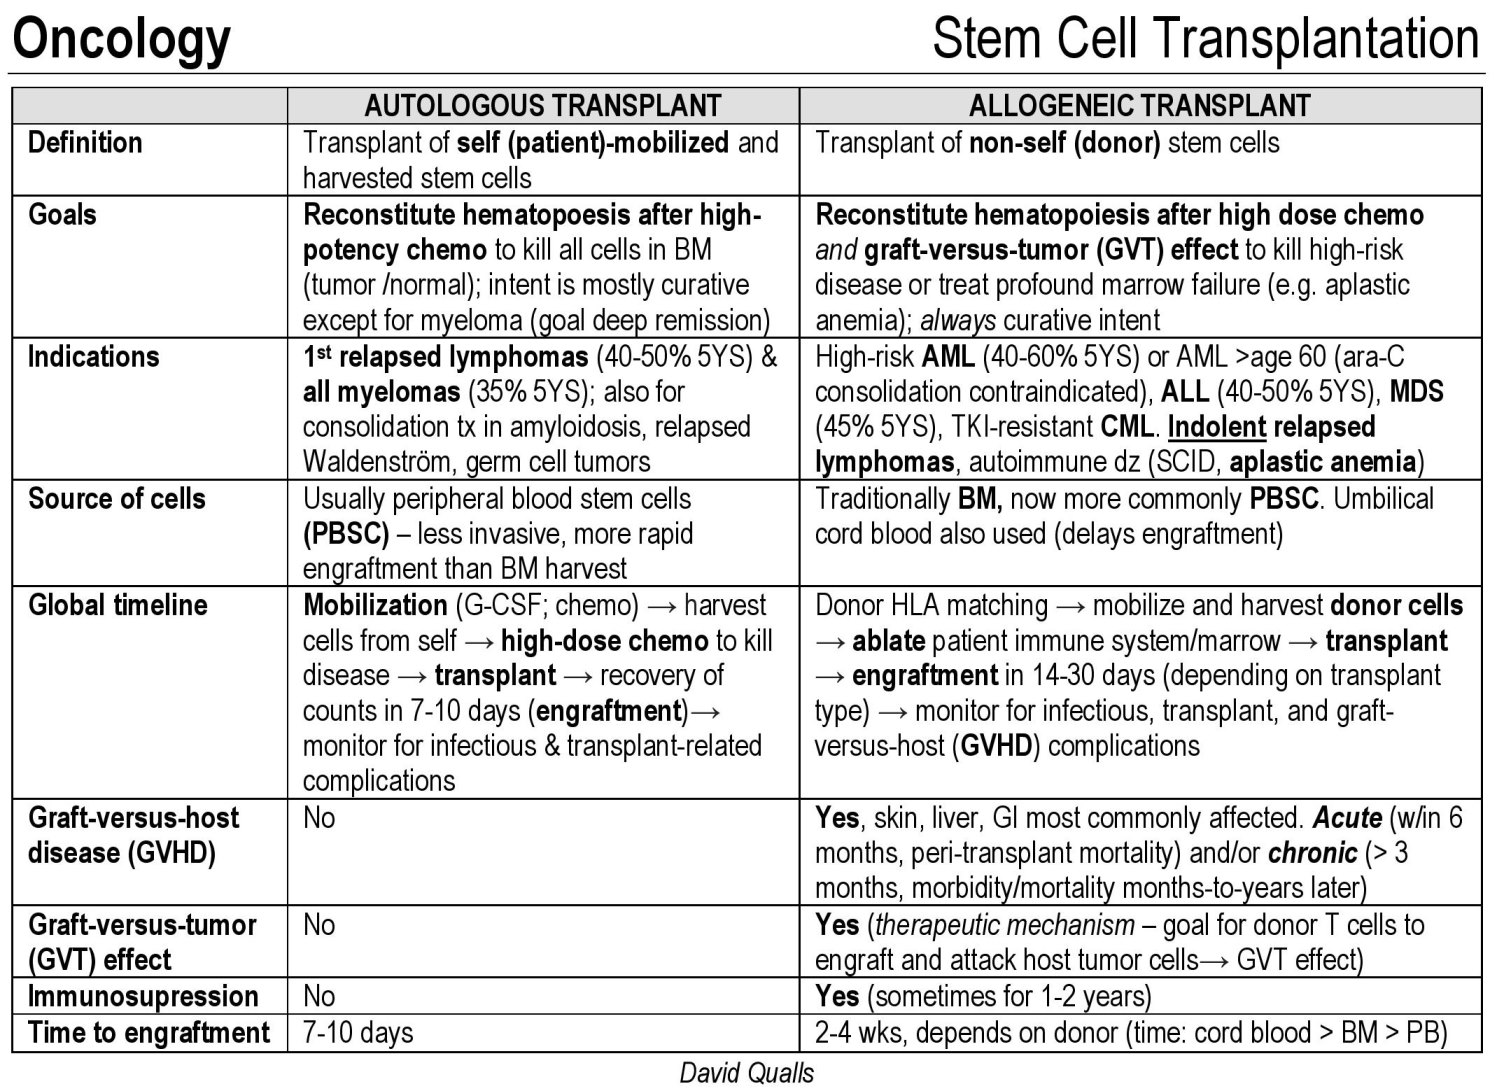 Autologous Vs Allogeneic Stem Cell Transplantation Autologous Transplant Transplant Of Self